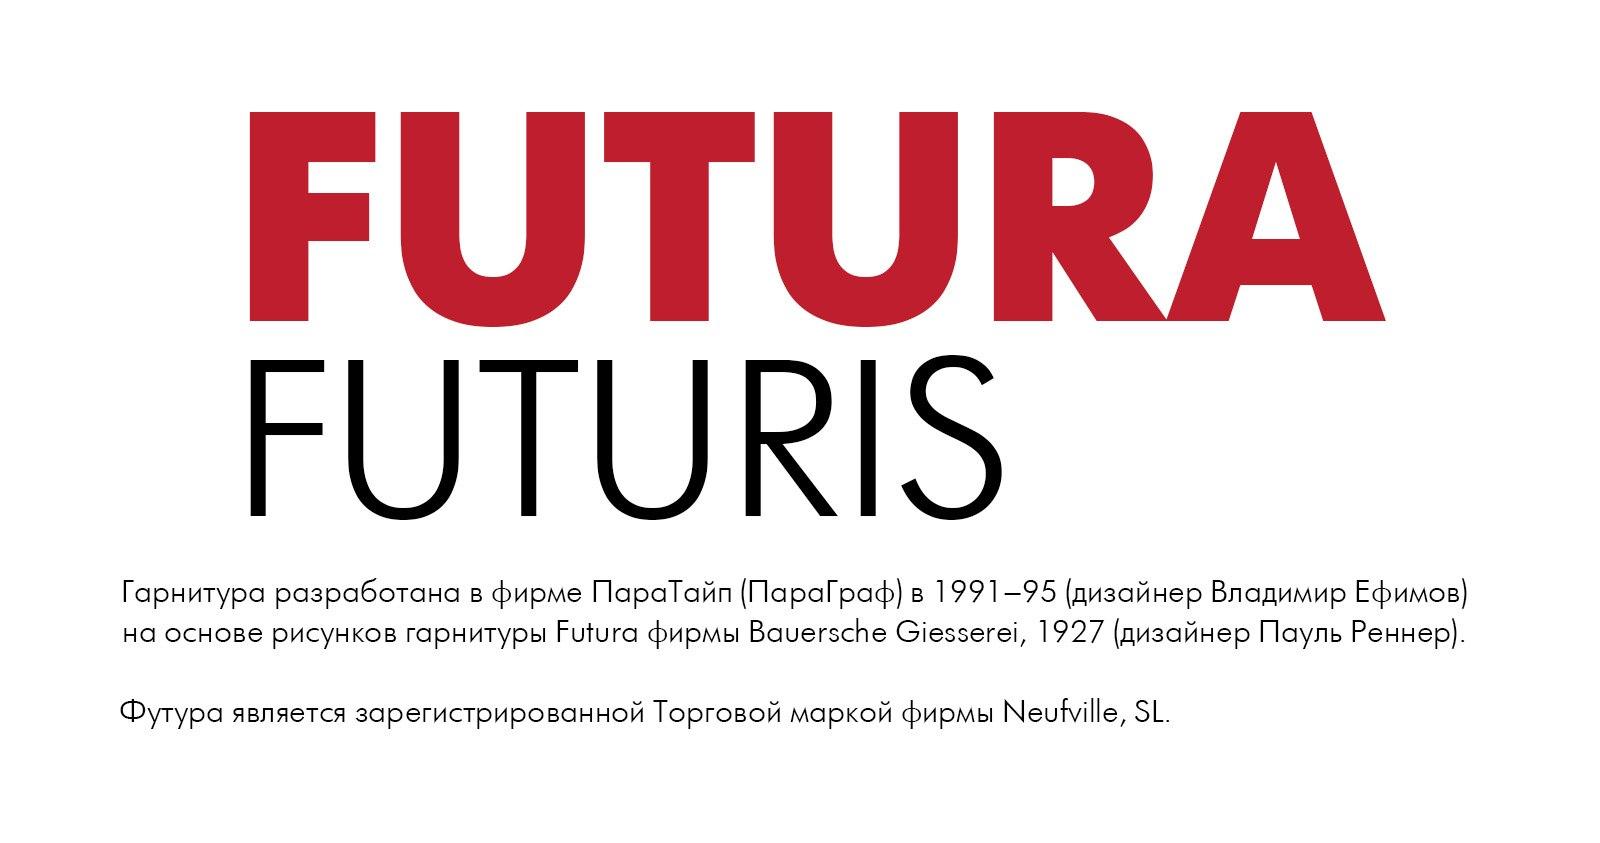 Font Futura Futuris